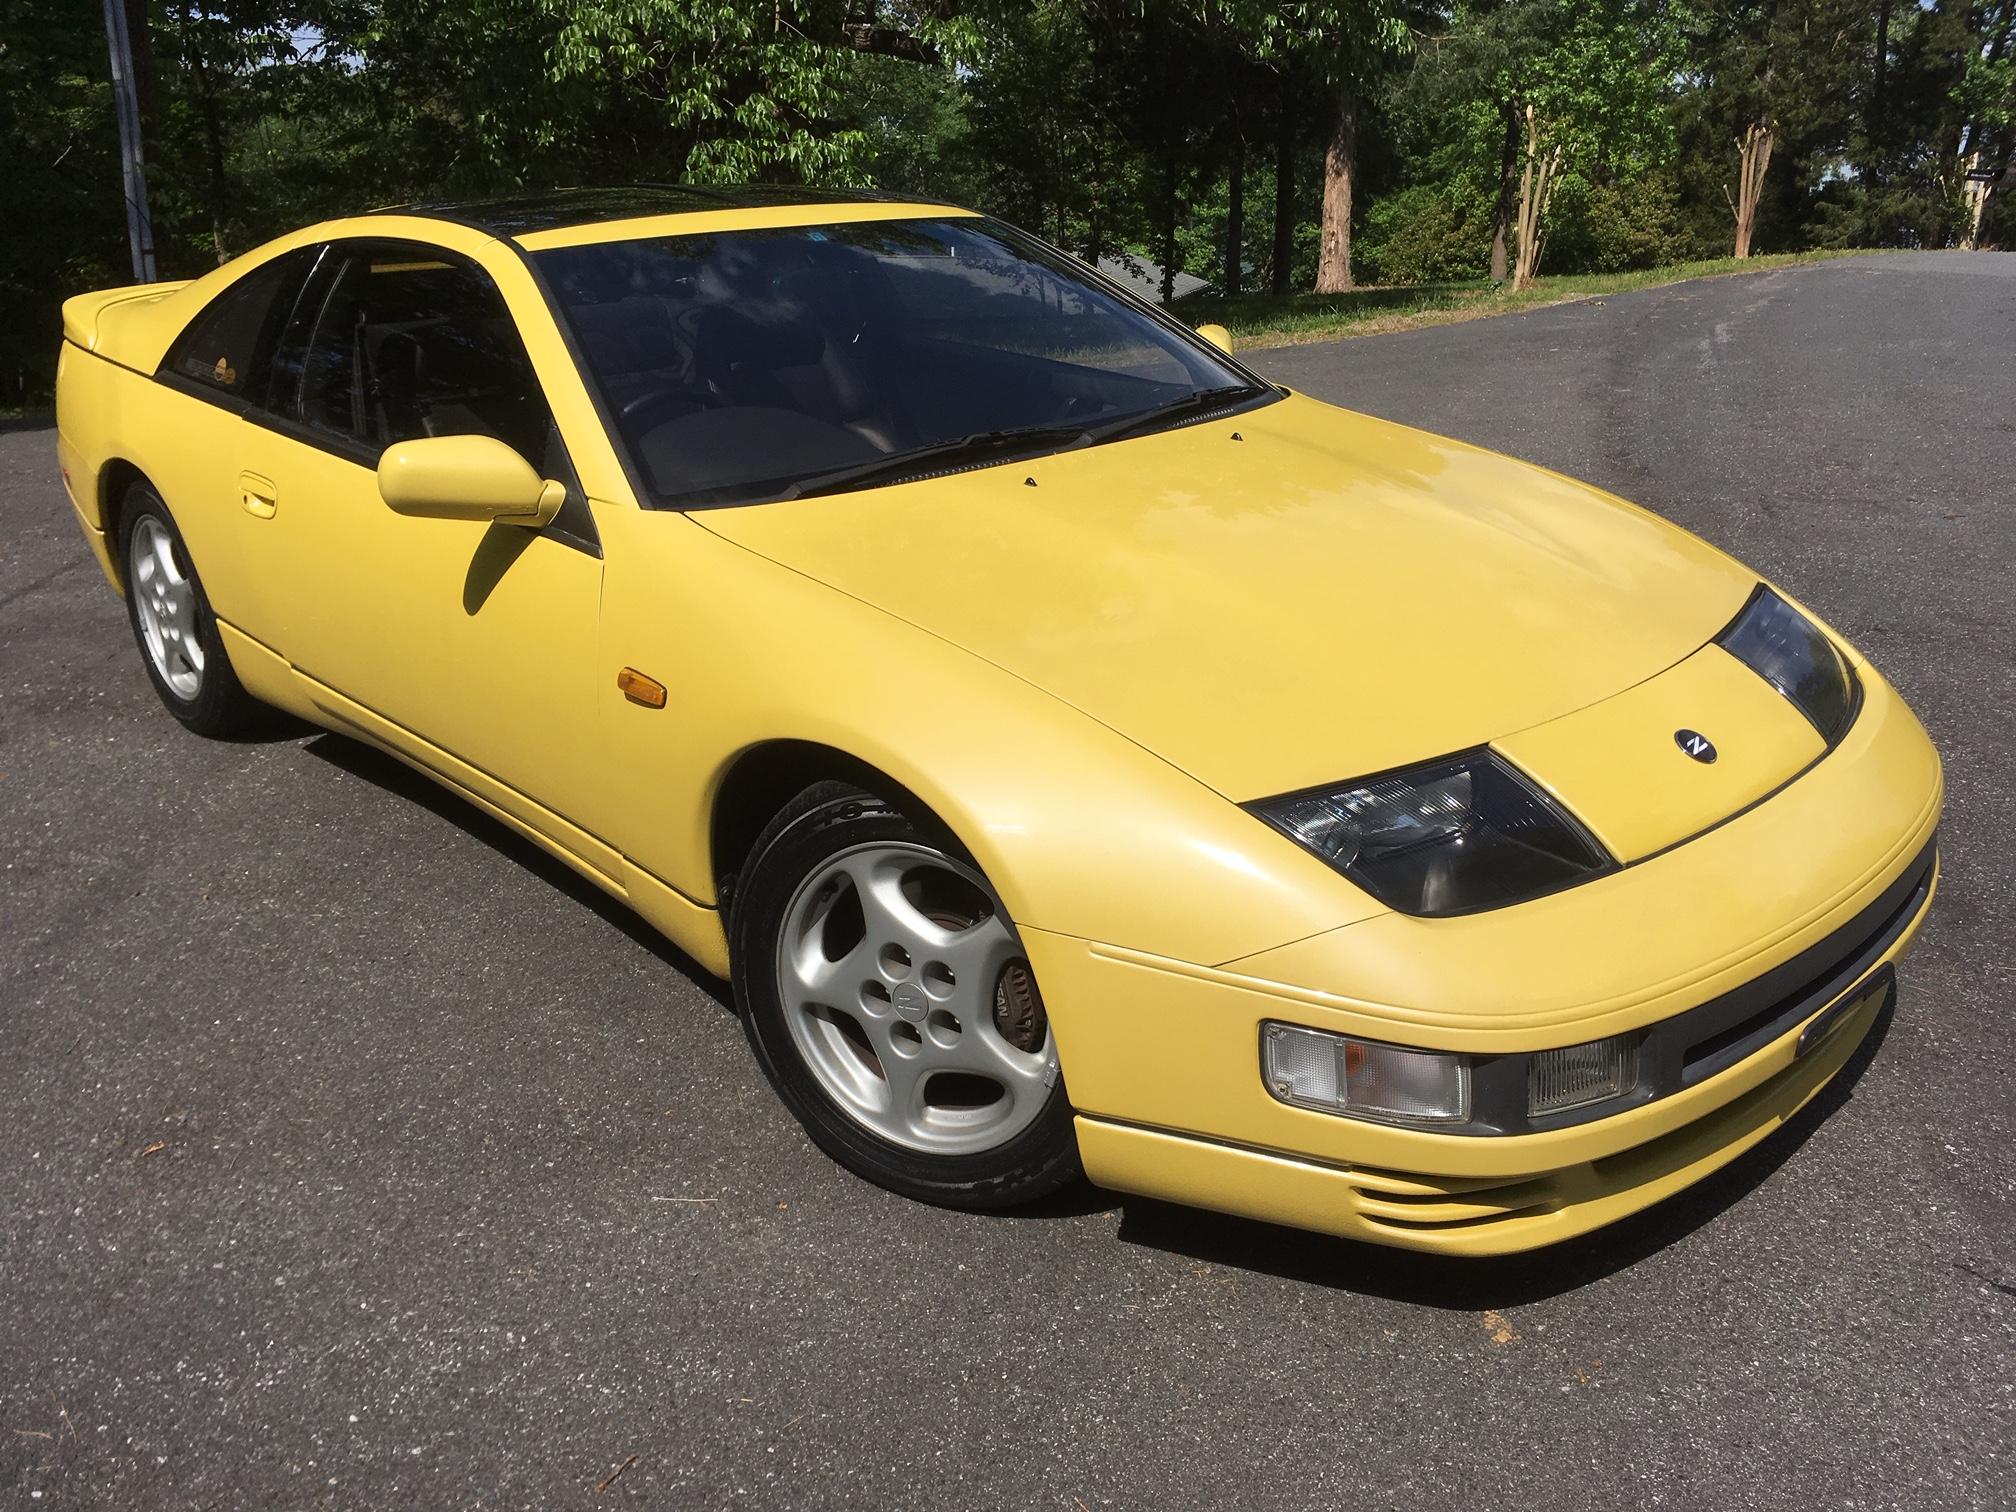 1990 JDM 300zx twin turbo 2+2 yellow pearlglow